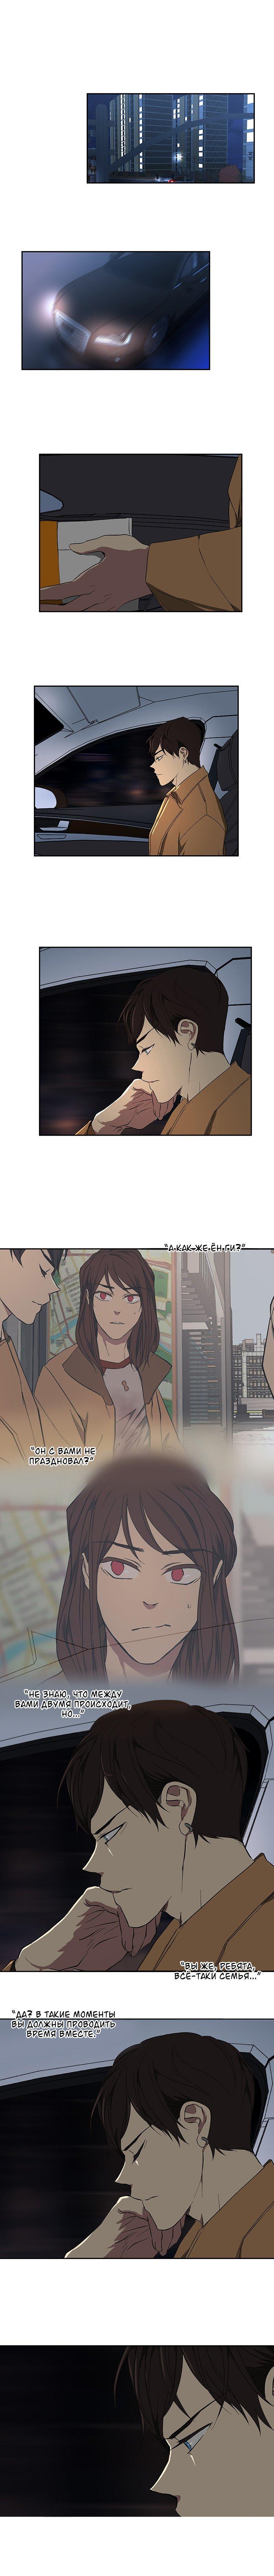 Манга Я люблю Ю / I love Yoo  - Том 1 Глава 42 Страница 1